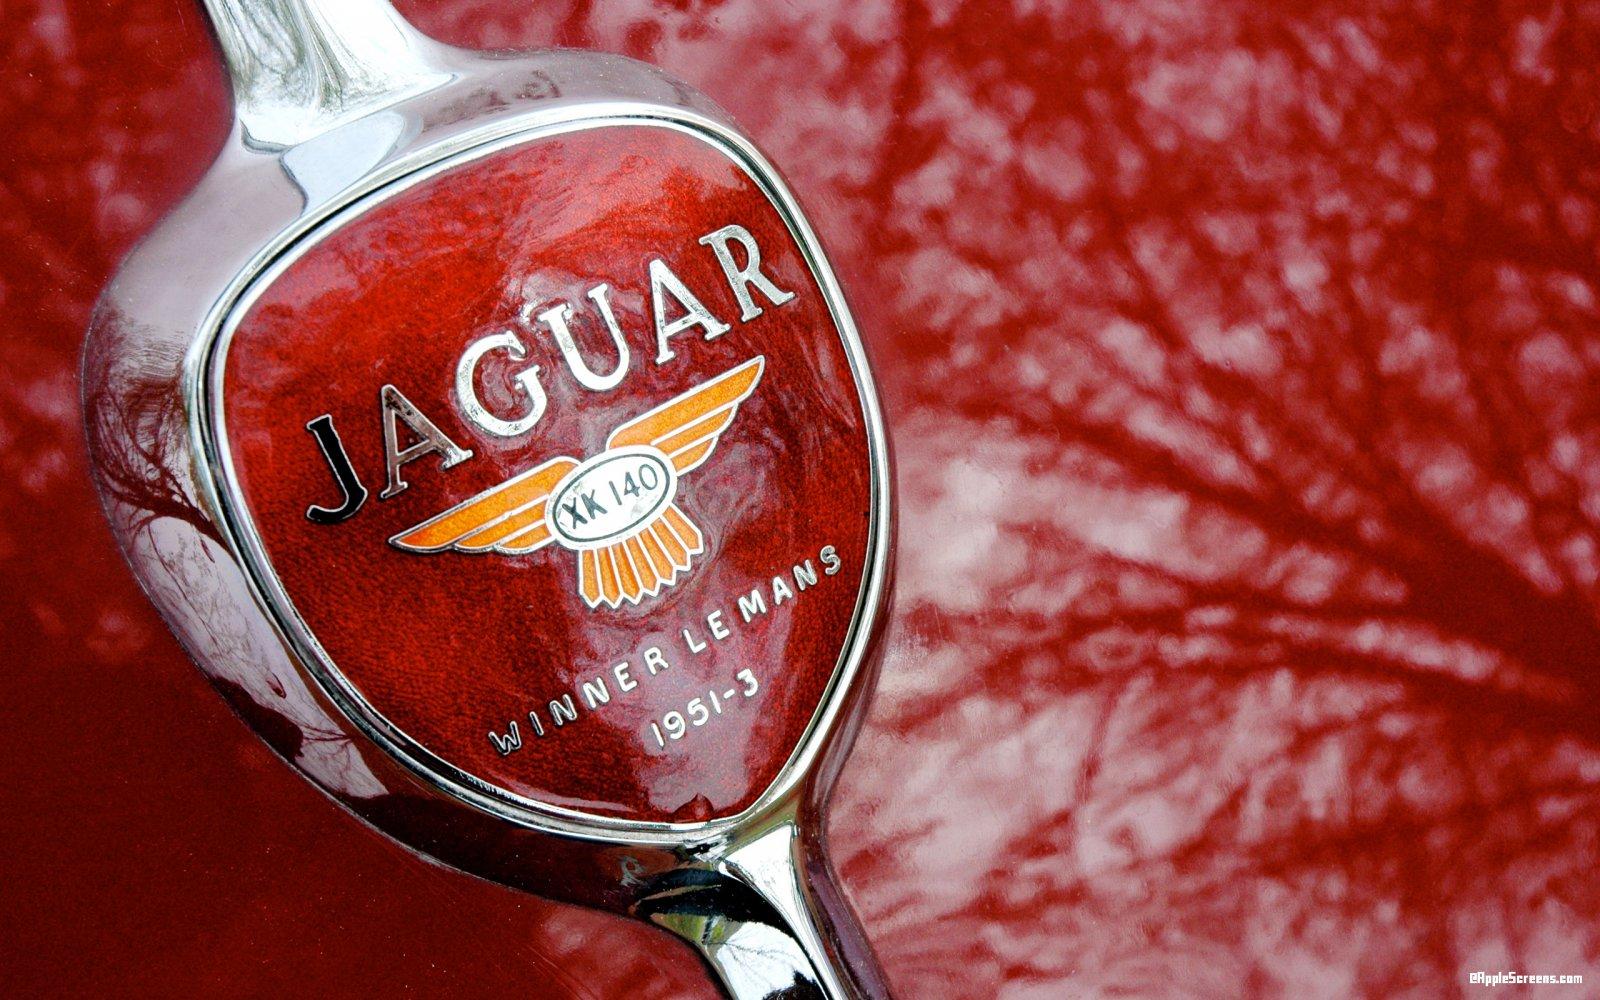 fond d'écran jaguar xk.jpg